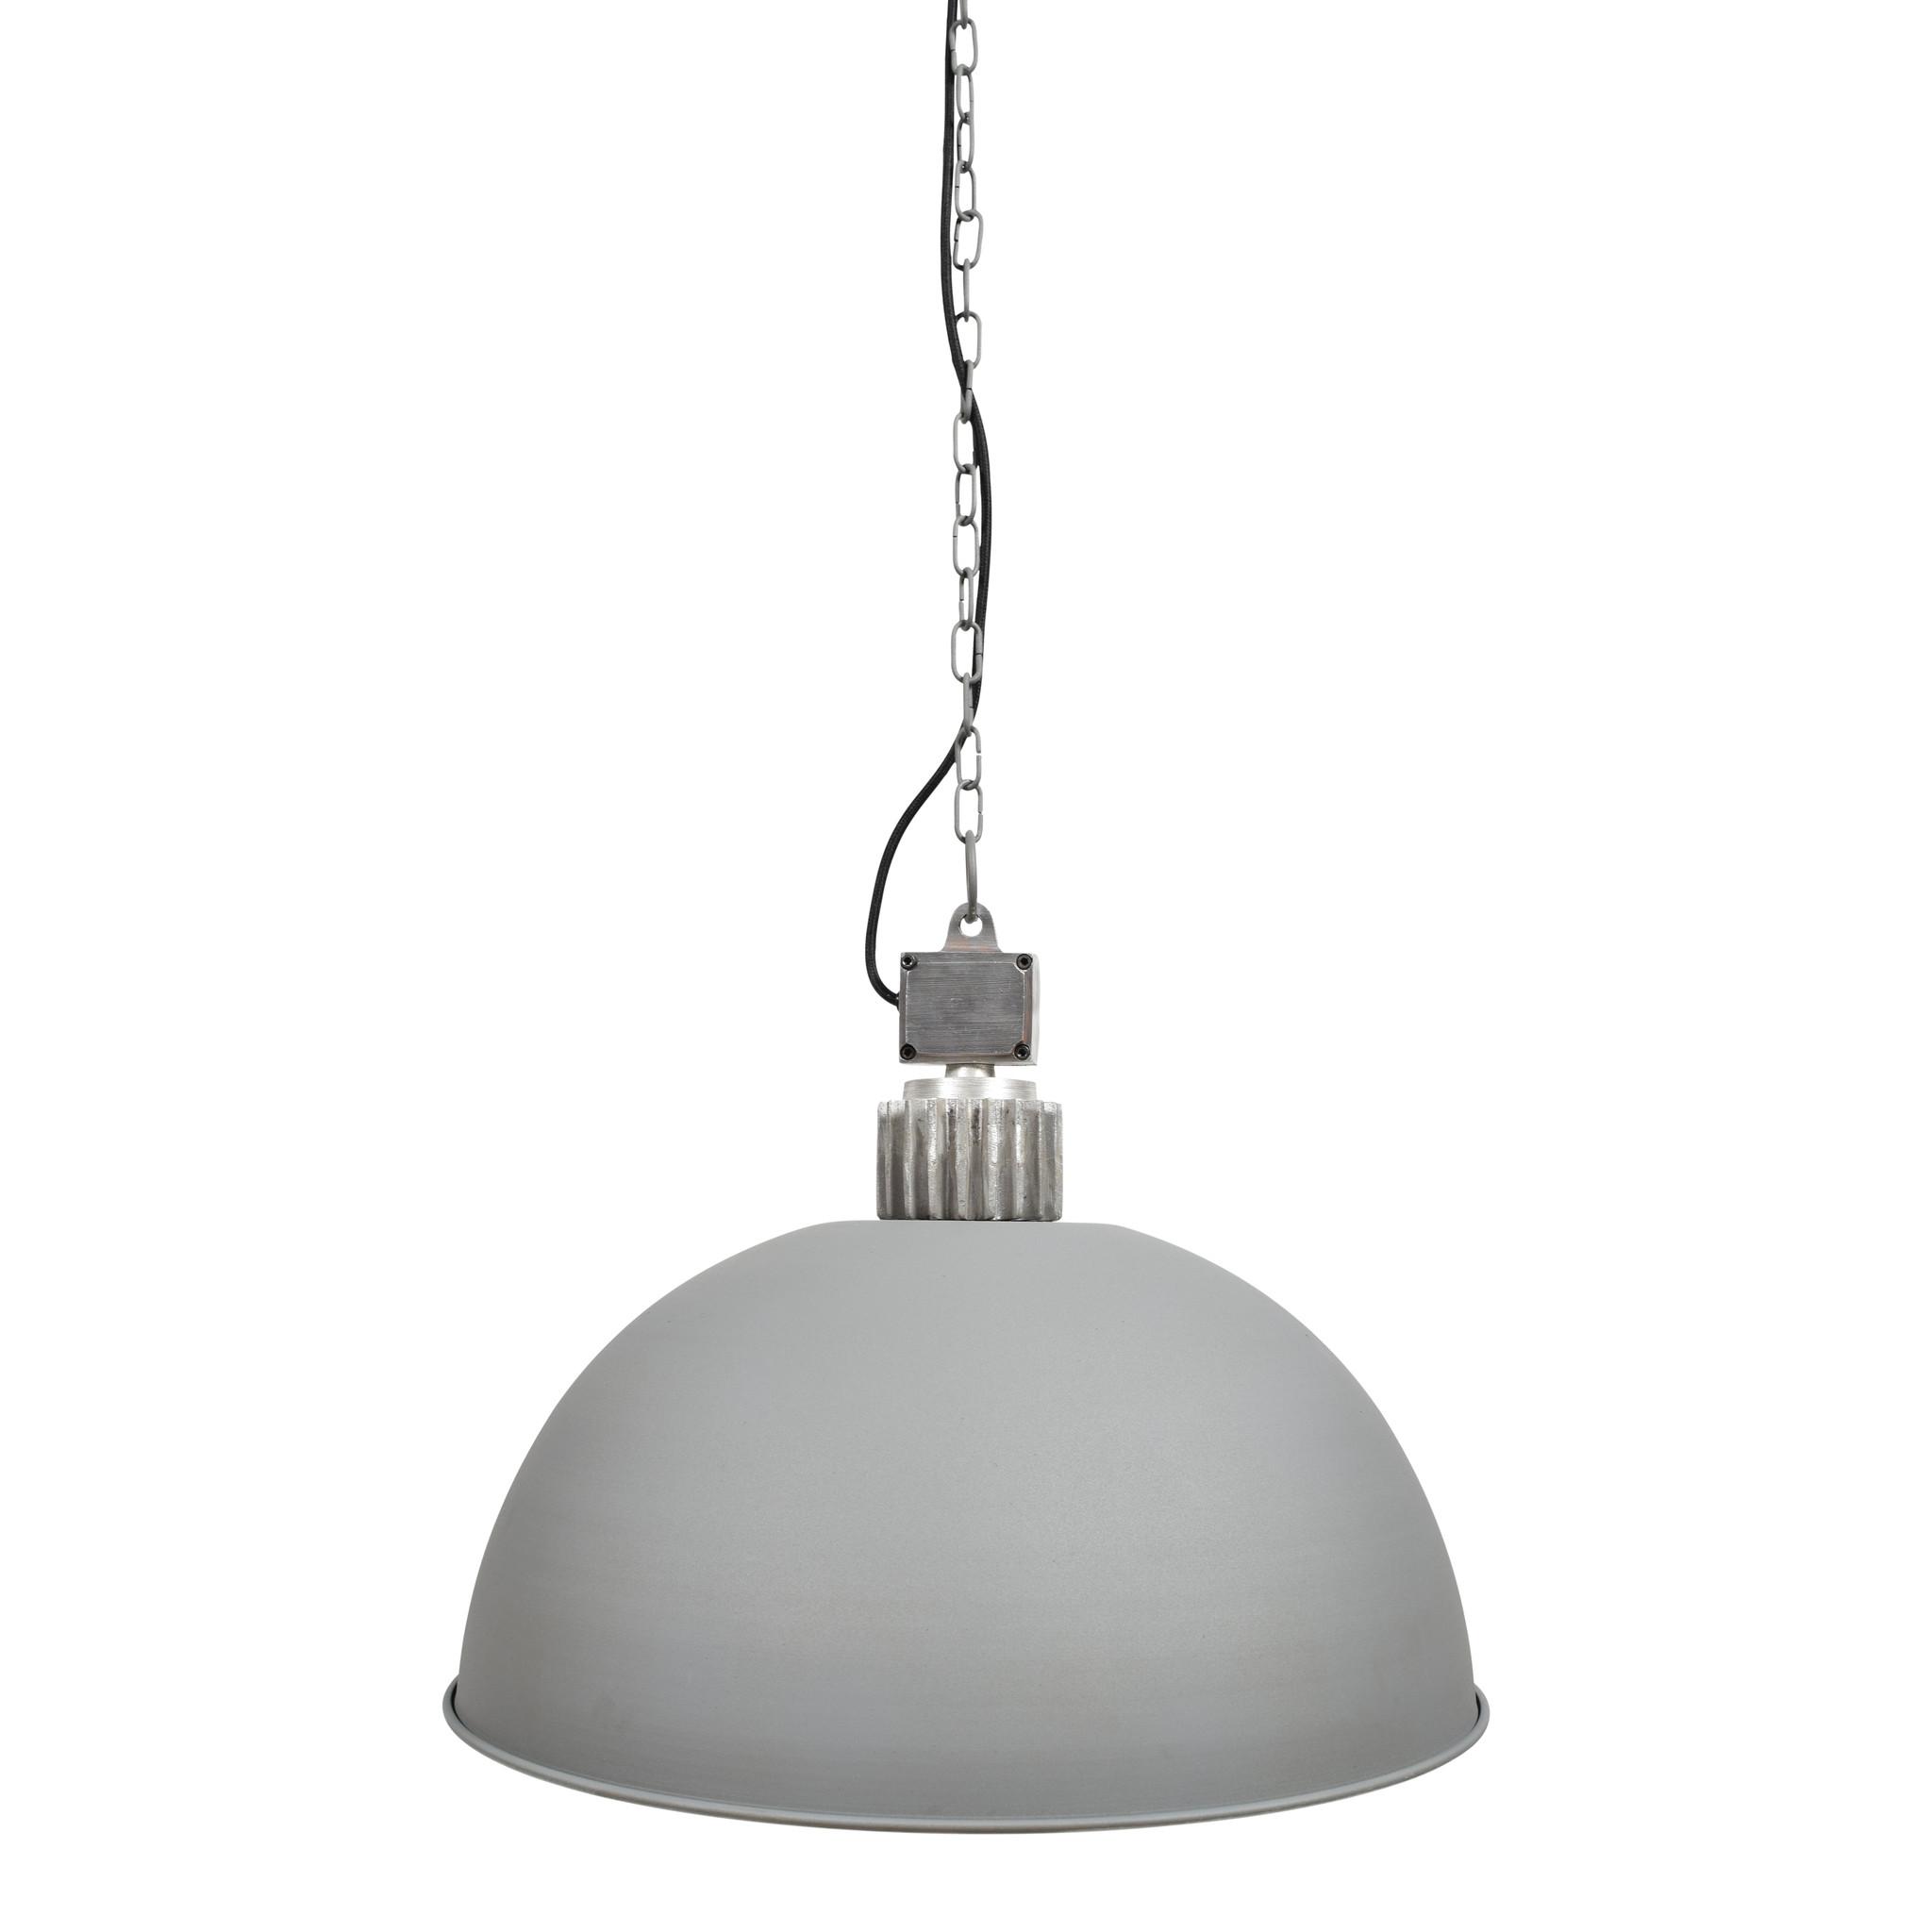 Urban Interiors Urban Interiors Hanglamp Factory ø50cm. vintage grey-AI-PL-12-VG-8719325005486